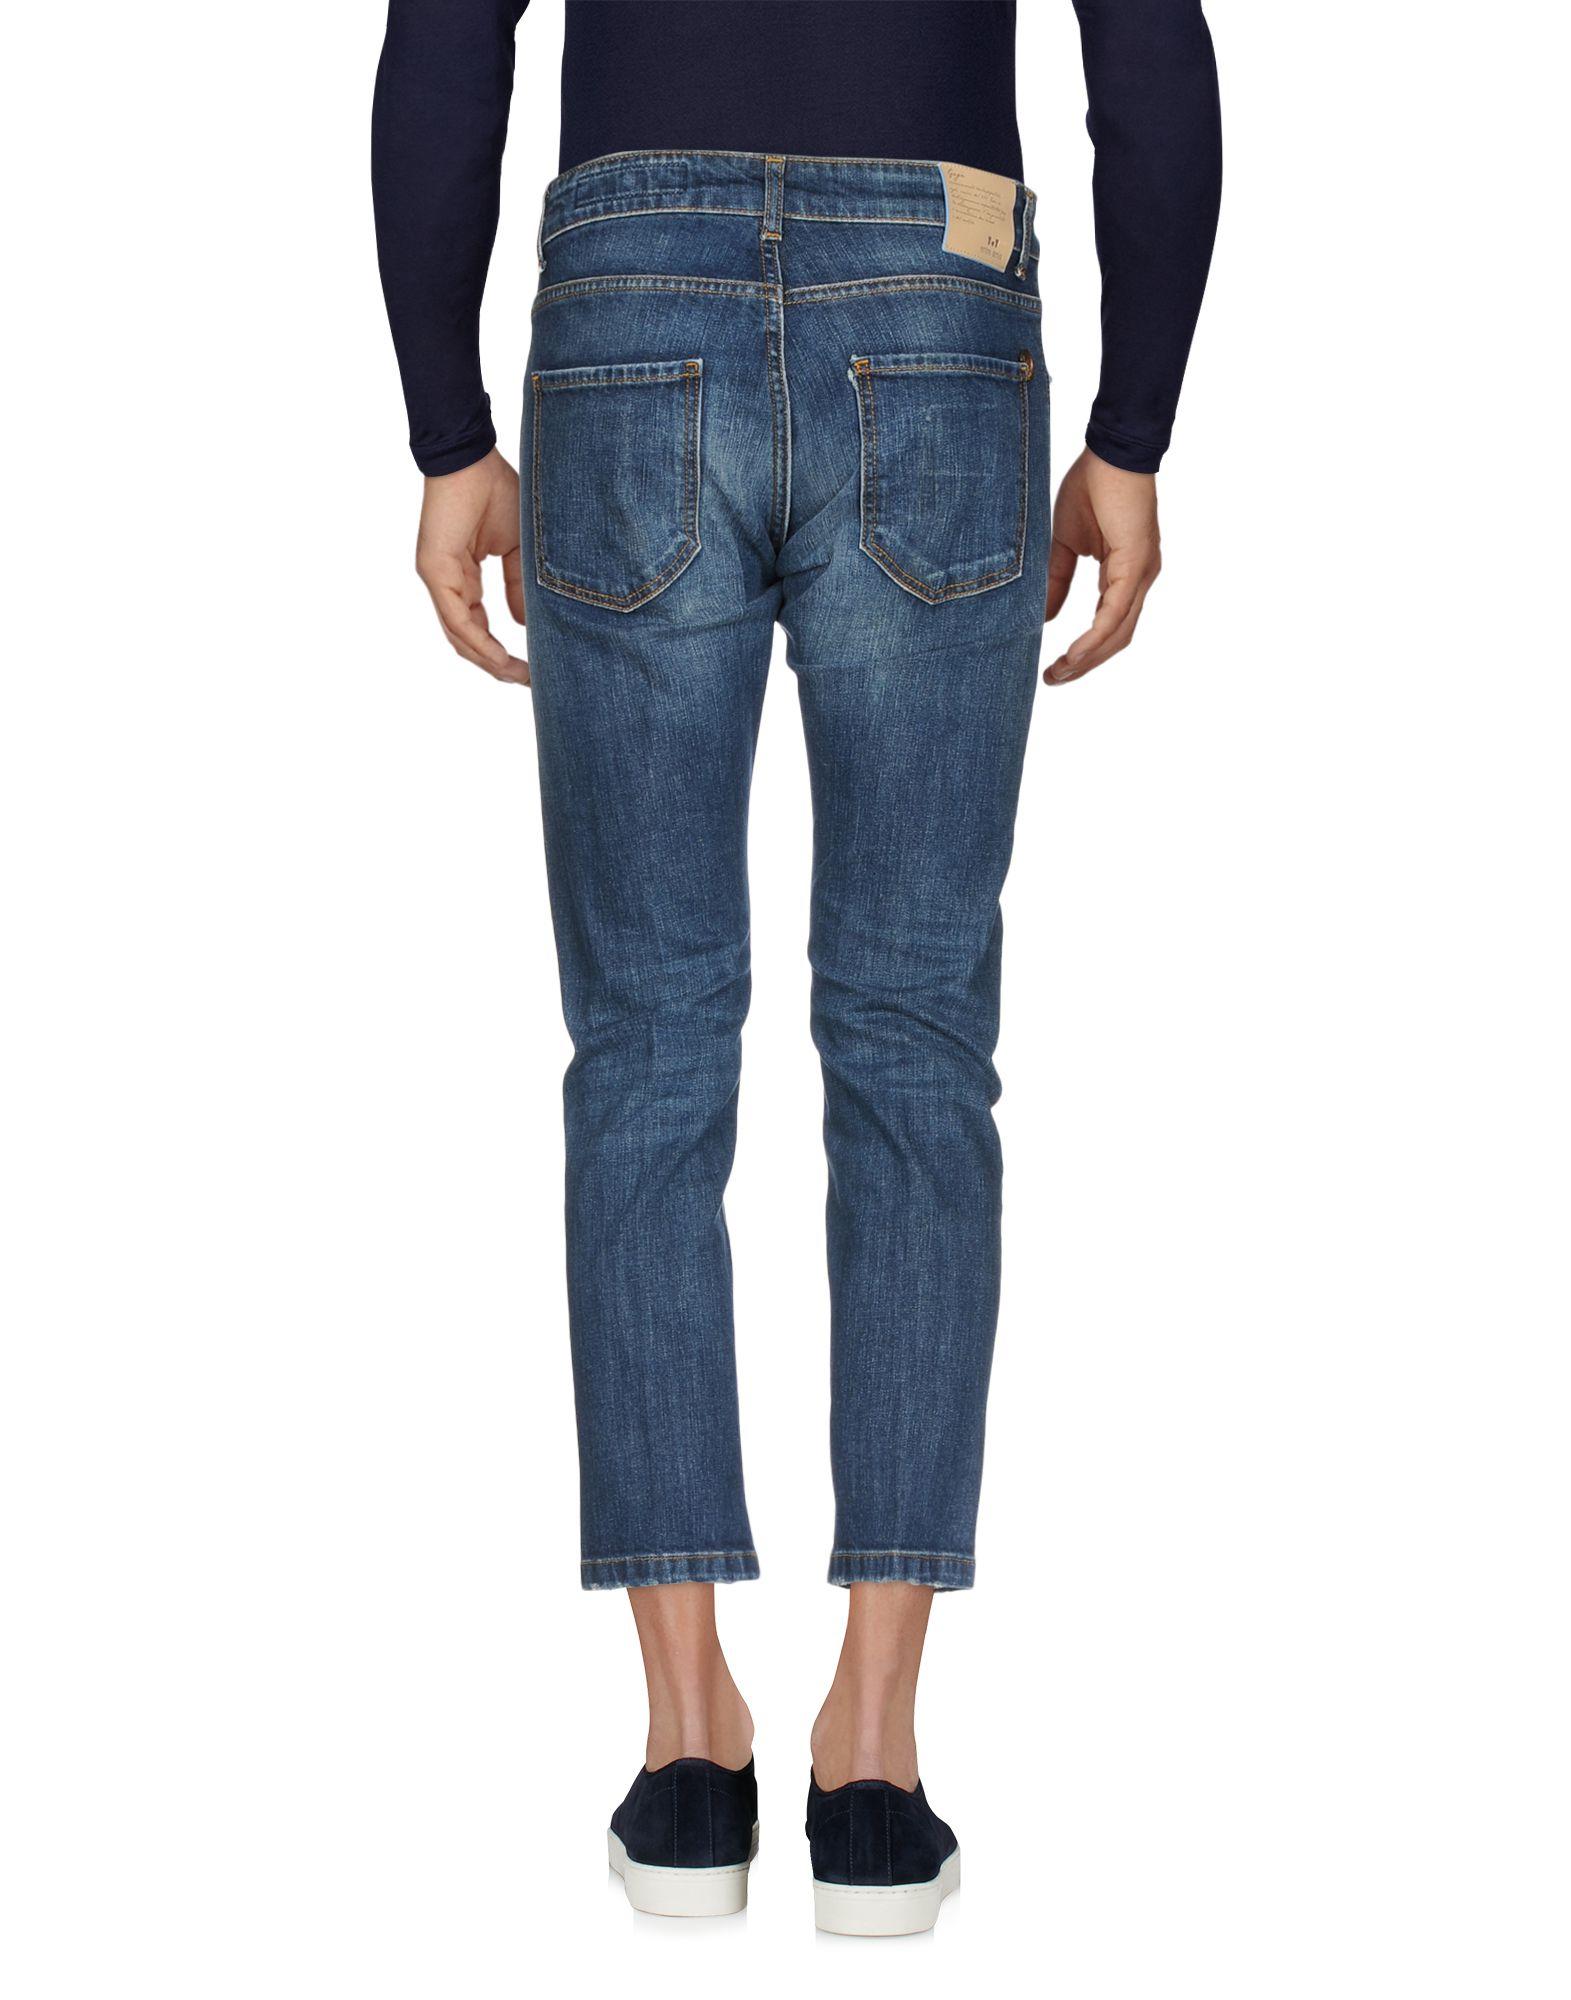 Pantaloni Jeans Entre Amis Uomo Uomo Amis - 42672503HL 94c6c9